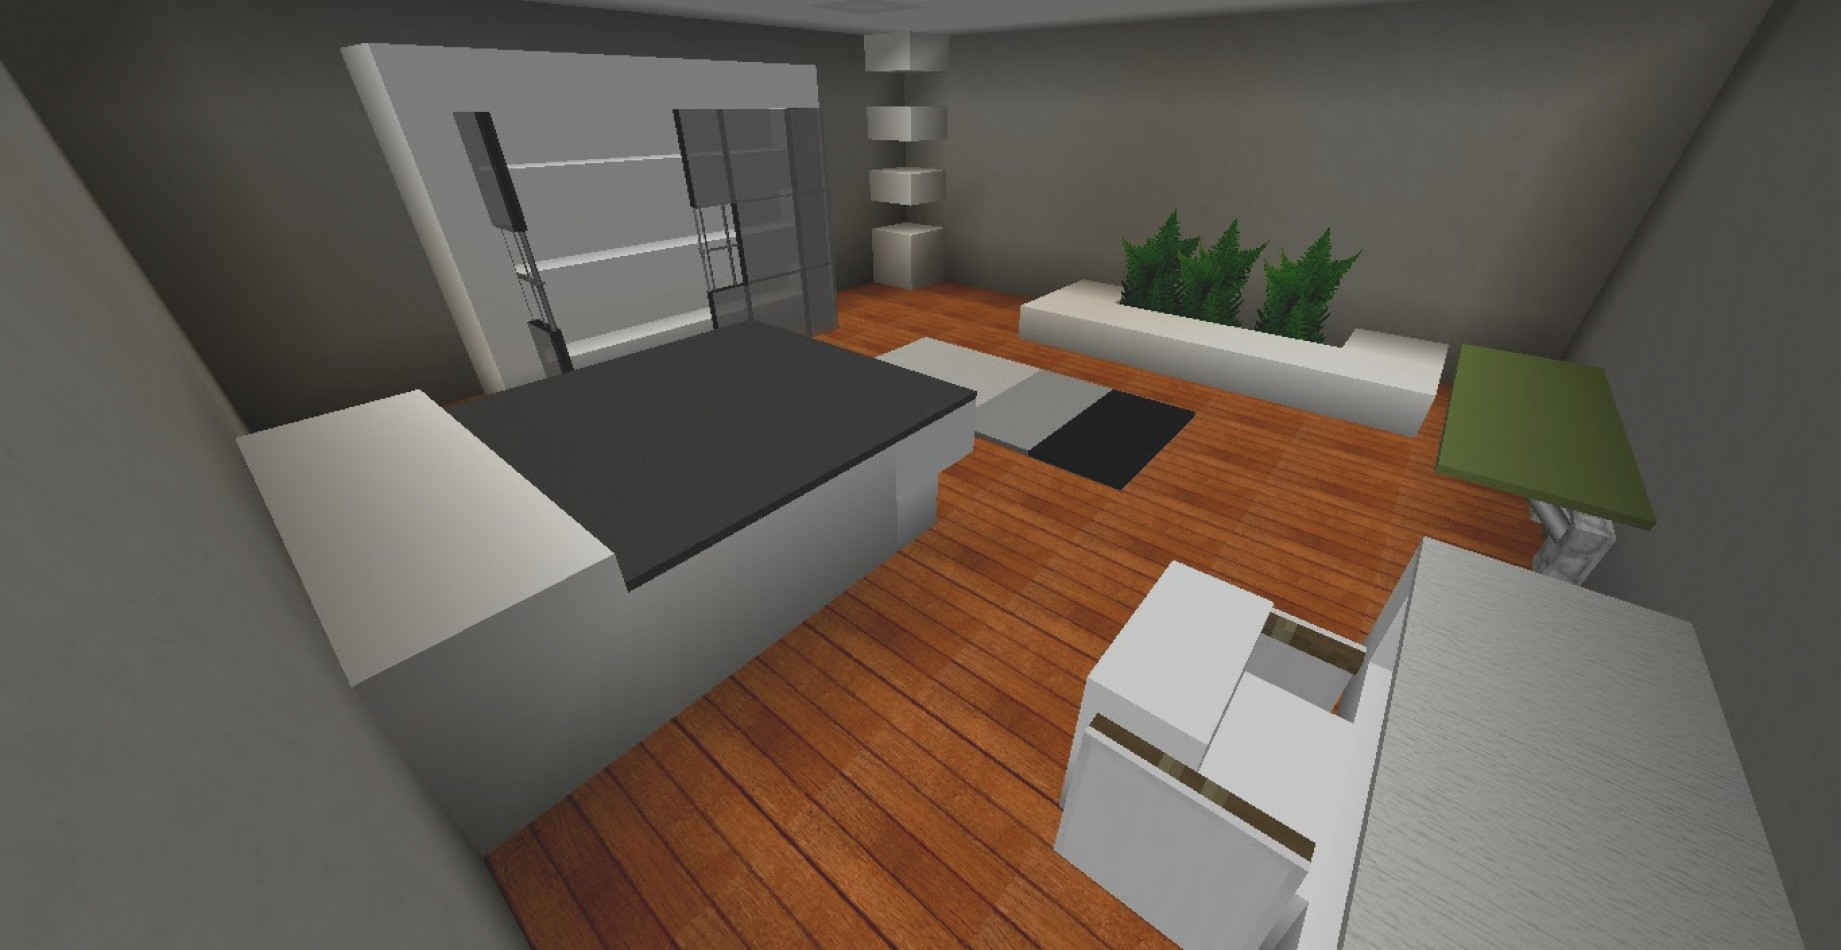 Minecraft Deco Moderne Beau Stock Deco Maison Minecraft Inspirational Beautiful Ment Faire Une Chambre